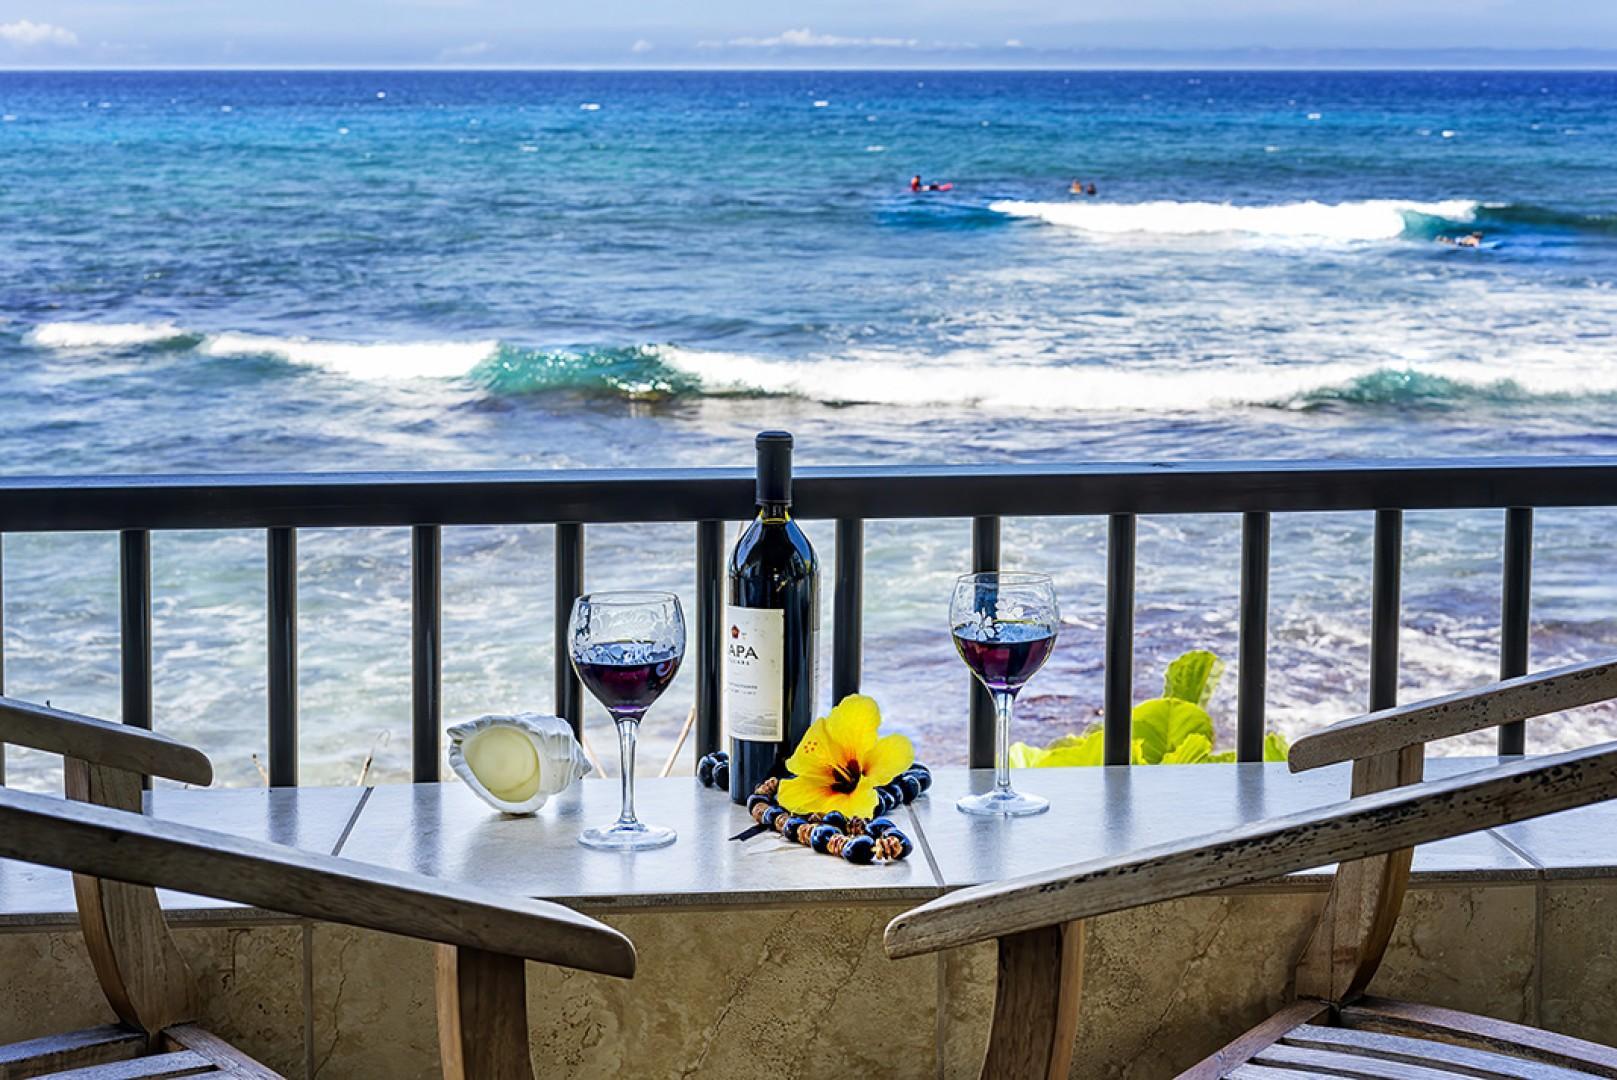 Wine & Waves anyone!